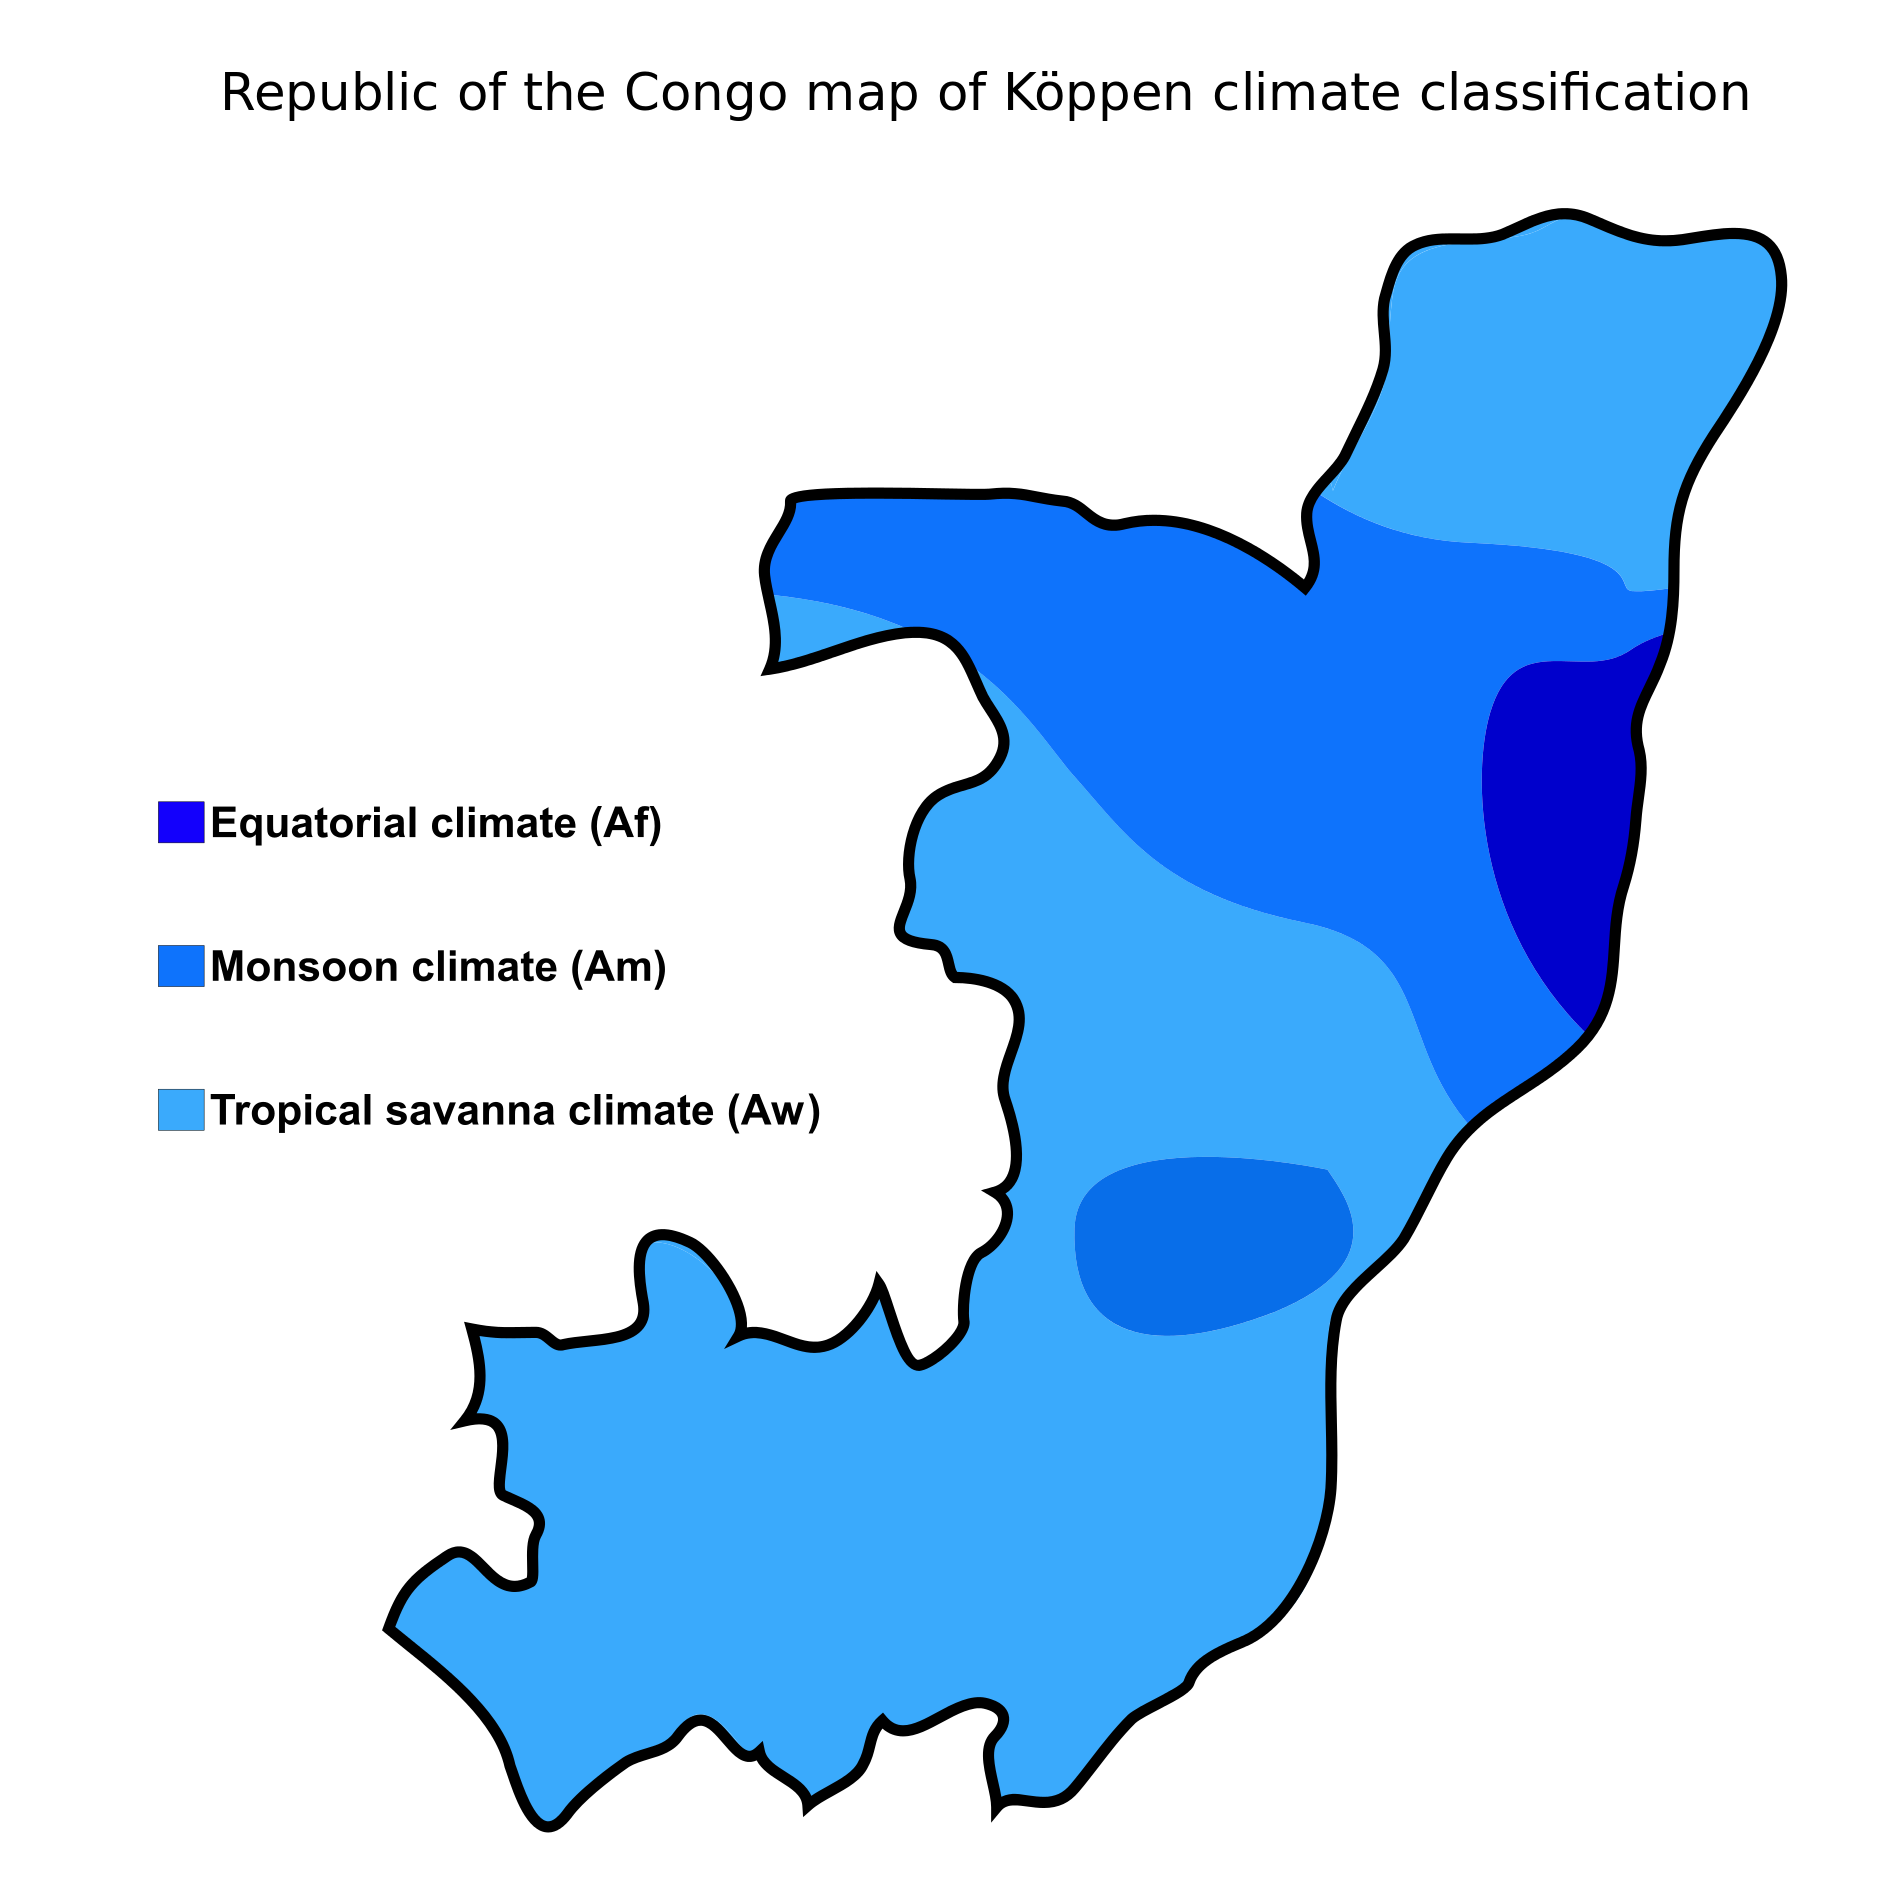 Republic of the congo map of koppen climate classification maps republic of the congo map of koppen climate classification sciox Choice Image